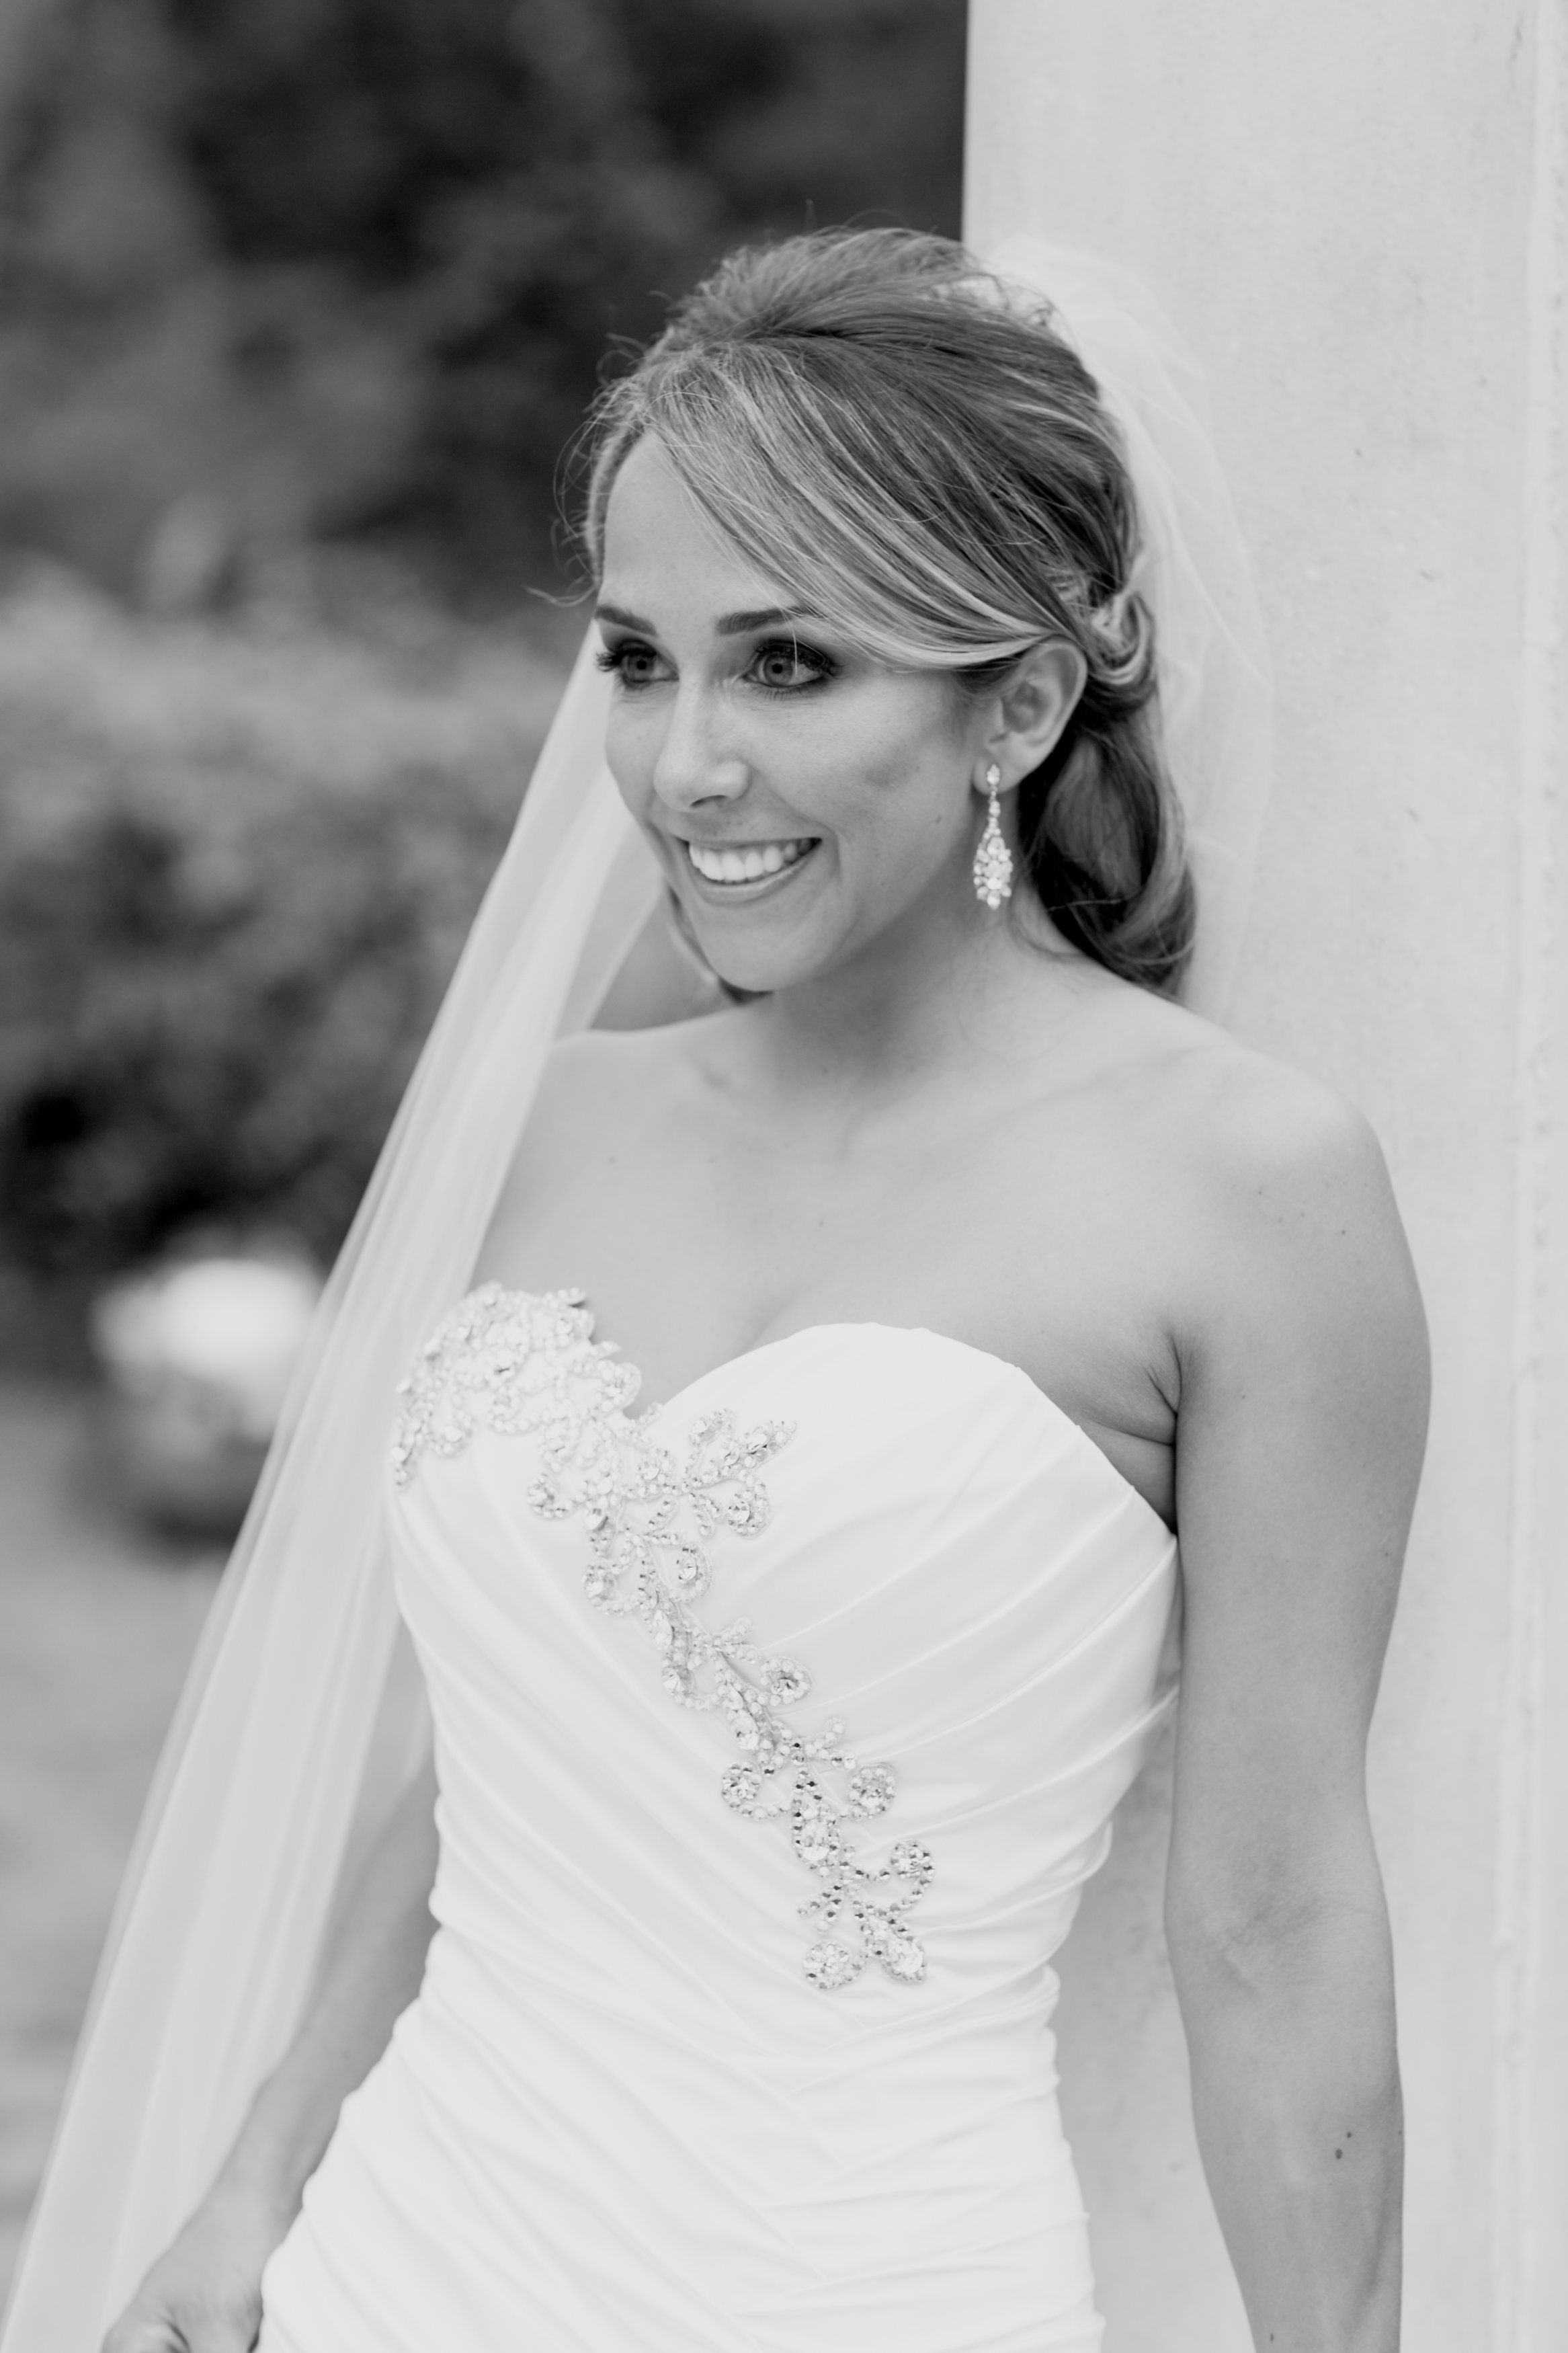 Ceci_New_York_Custom_Invitation_ New_Jersey_Wedding_Luxury_Personalized_Ceci_Style_Bride_Foil_Stamping18.jpg